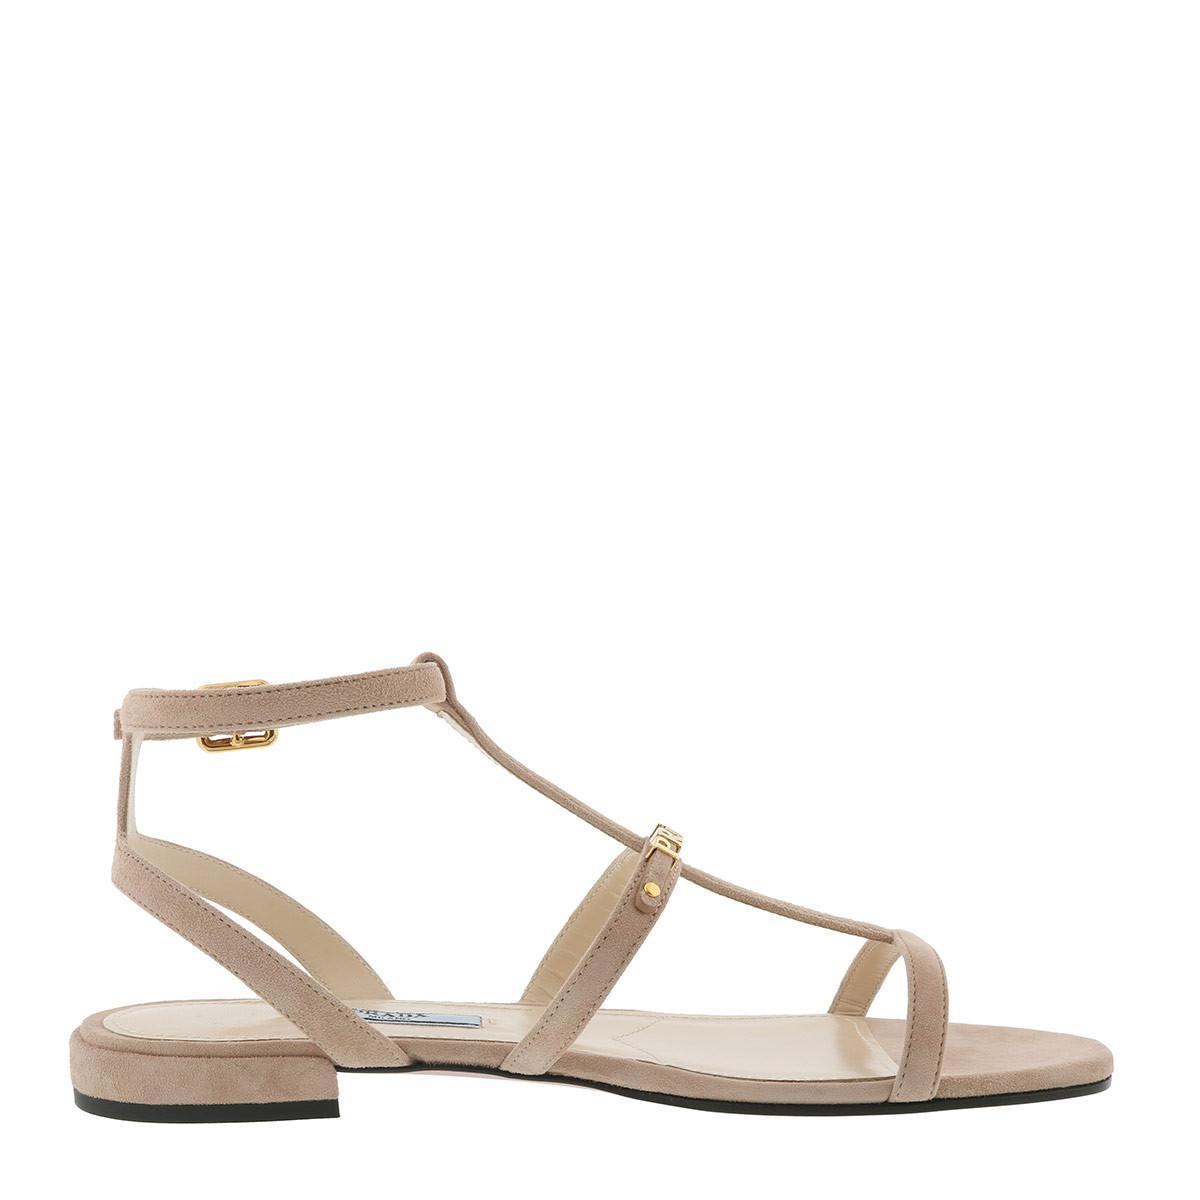 4de7f80bf830 Prada Flat Sandals Camoscio Goat Skin Nude in Natural - Lyst